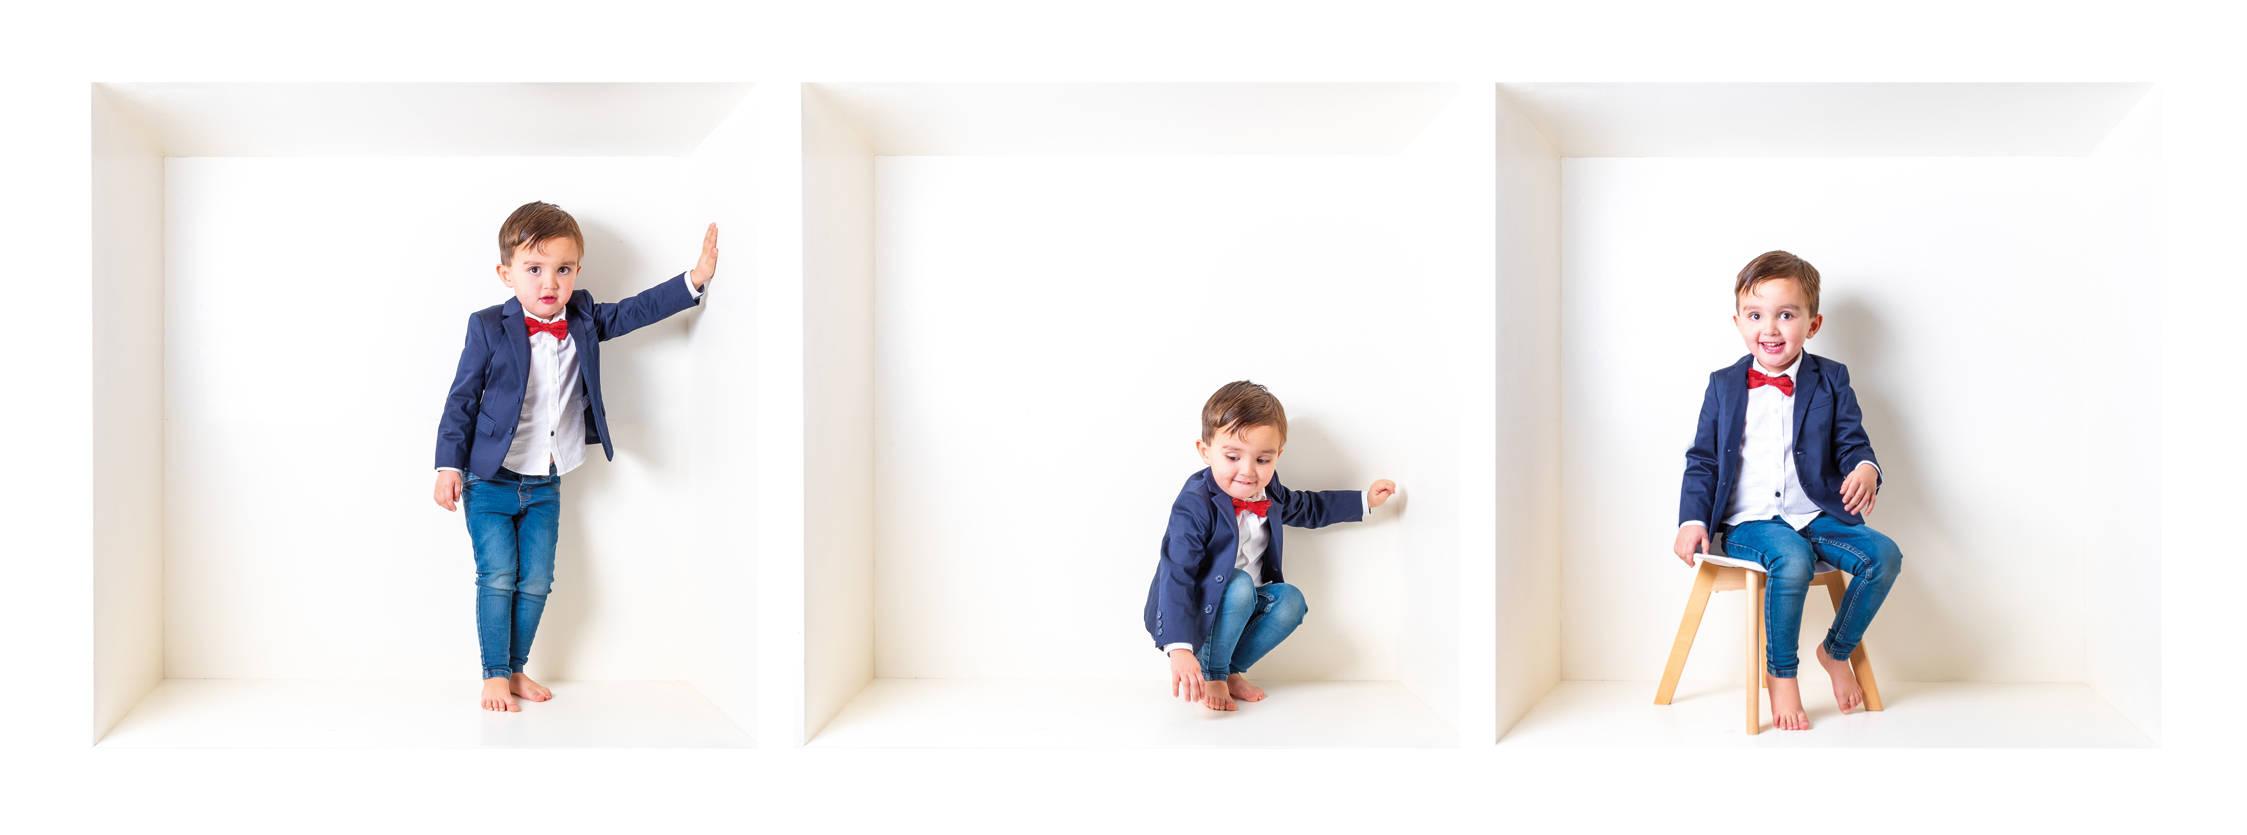 AXL IN THE BOX FOTOGRAFIE